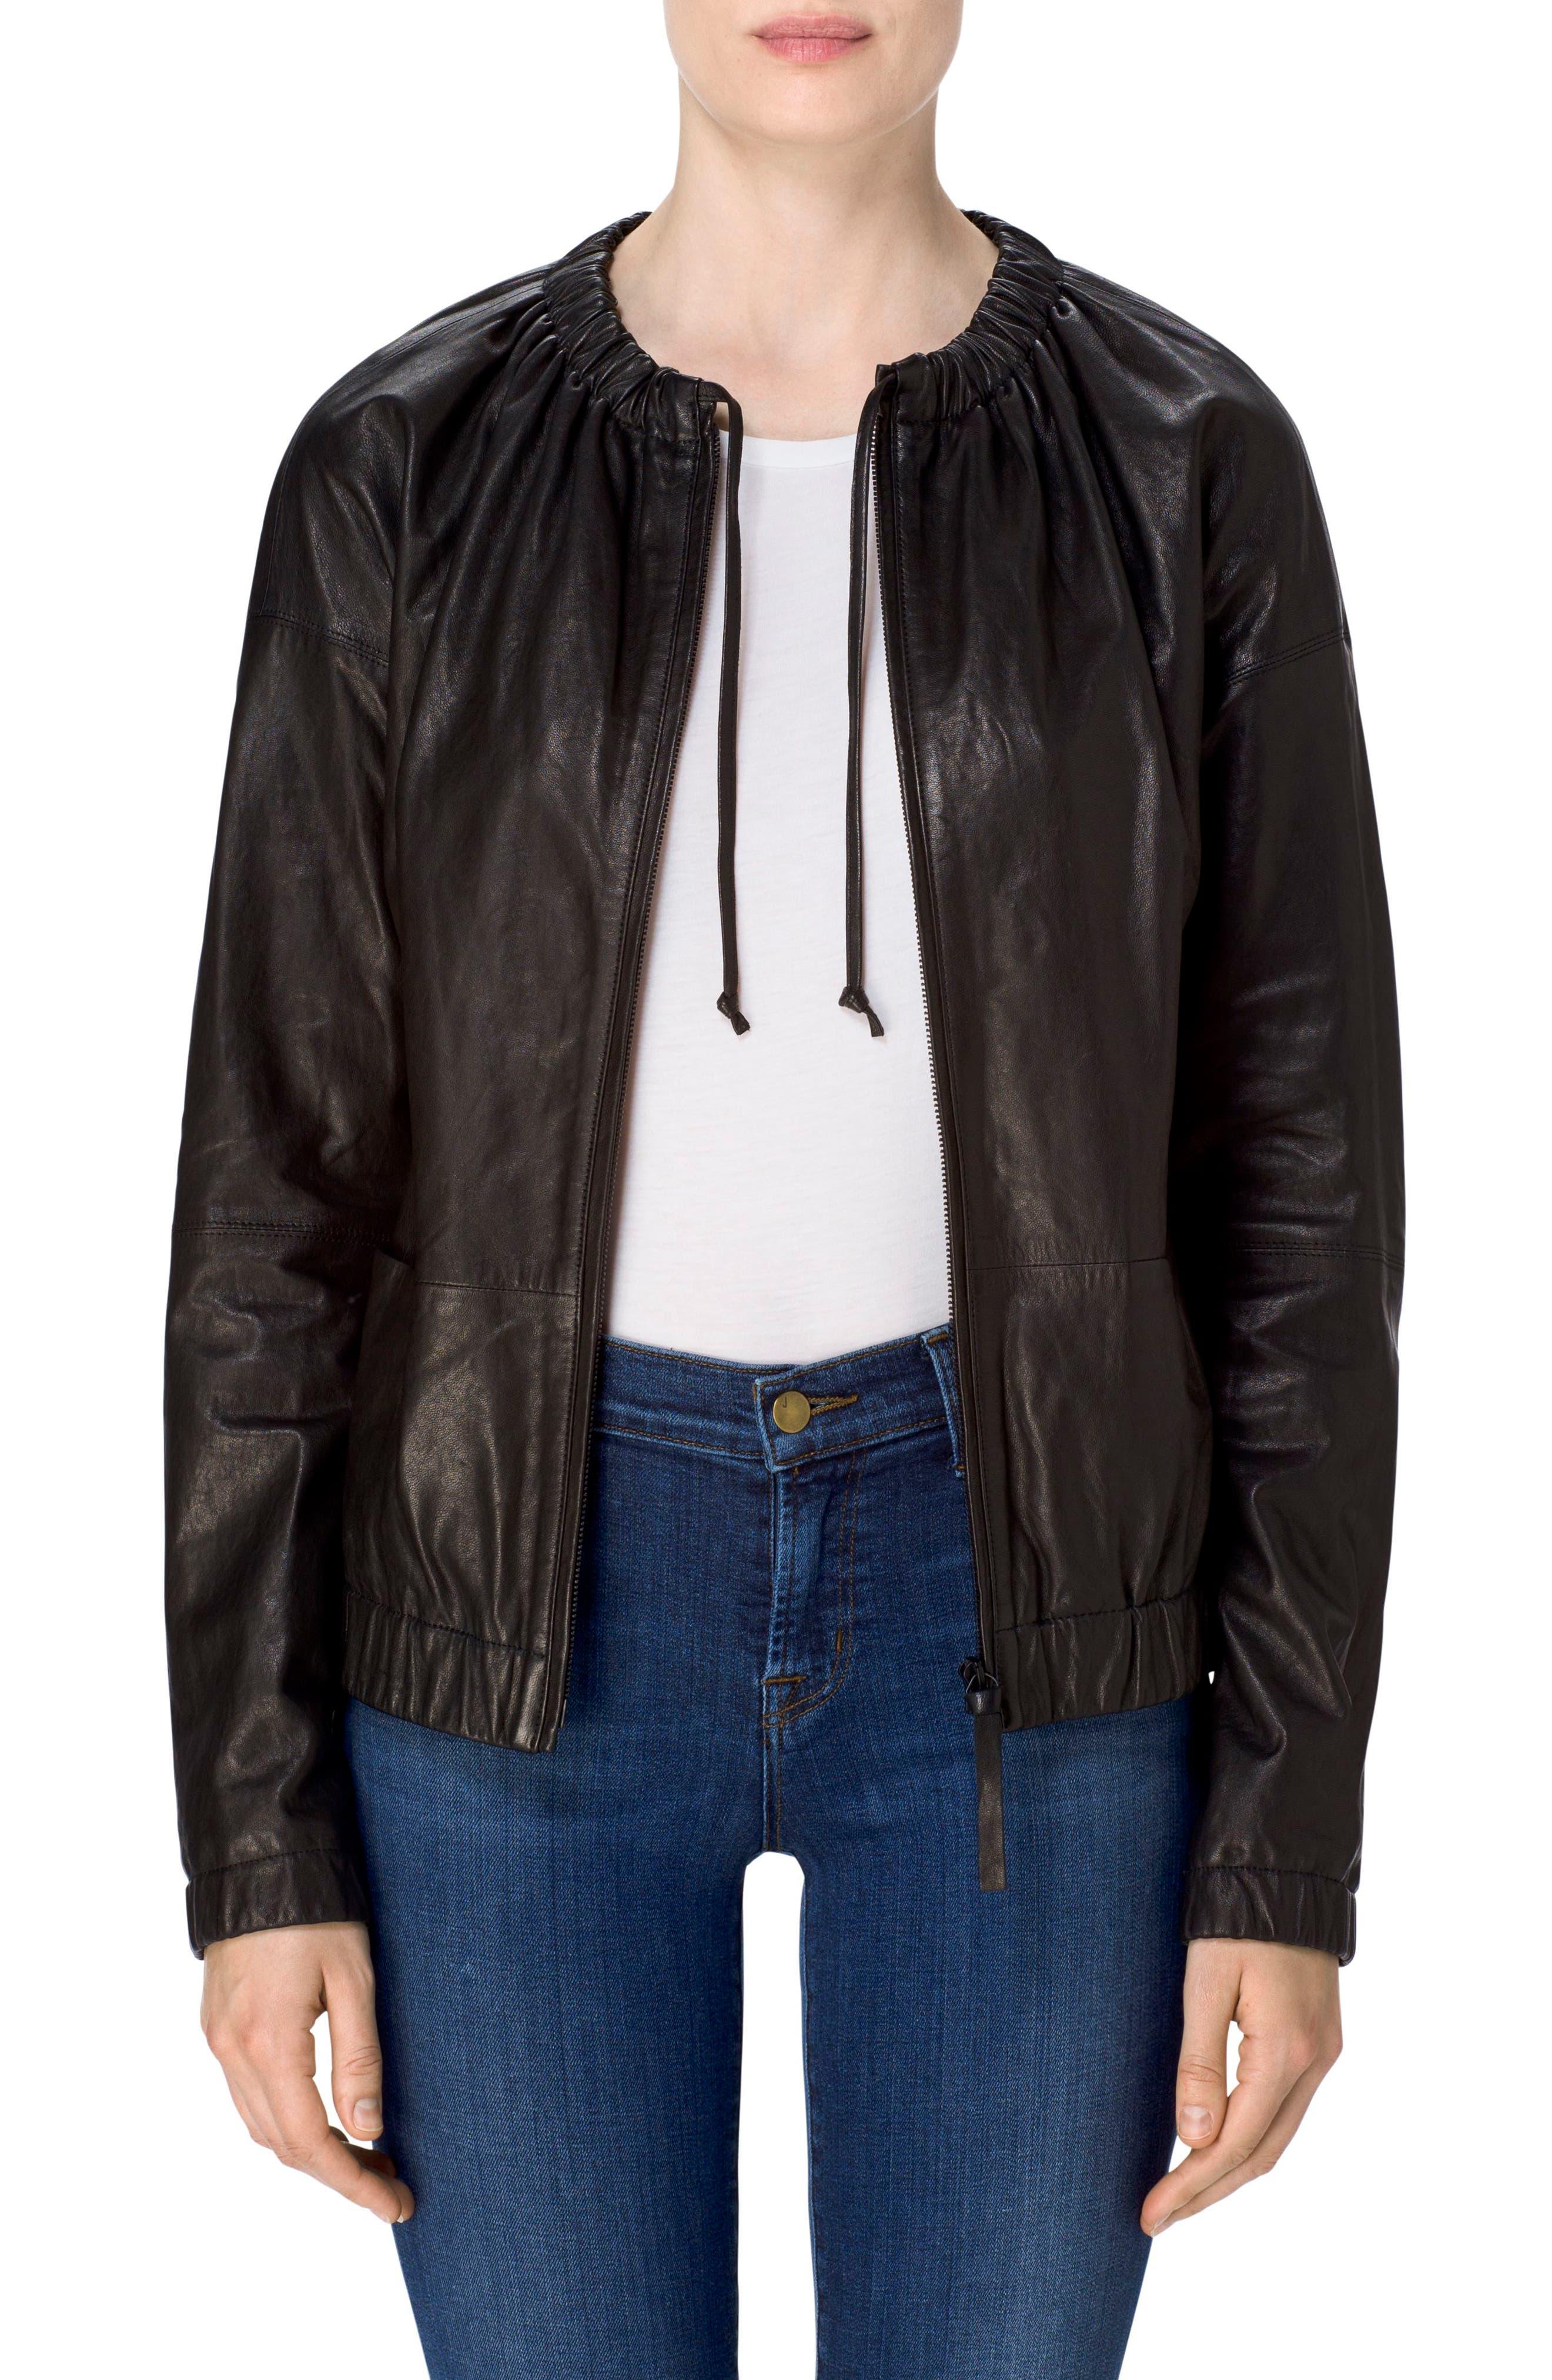 Baez Leather Bomber Jacket,                         Main,                         color, 001